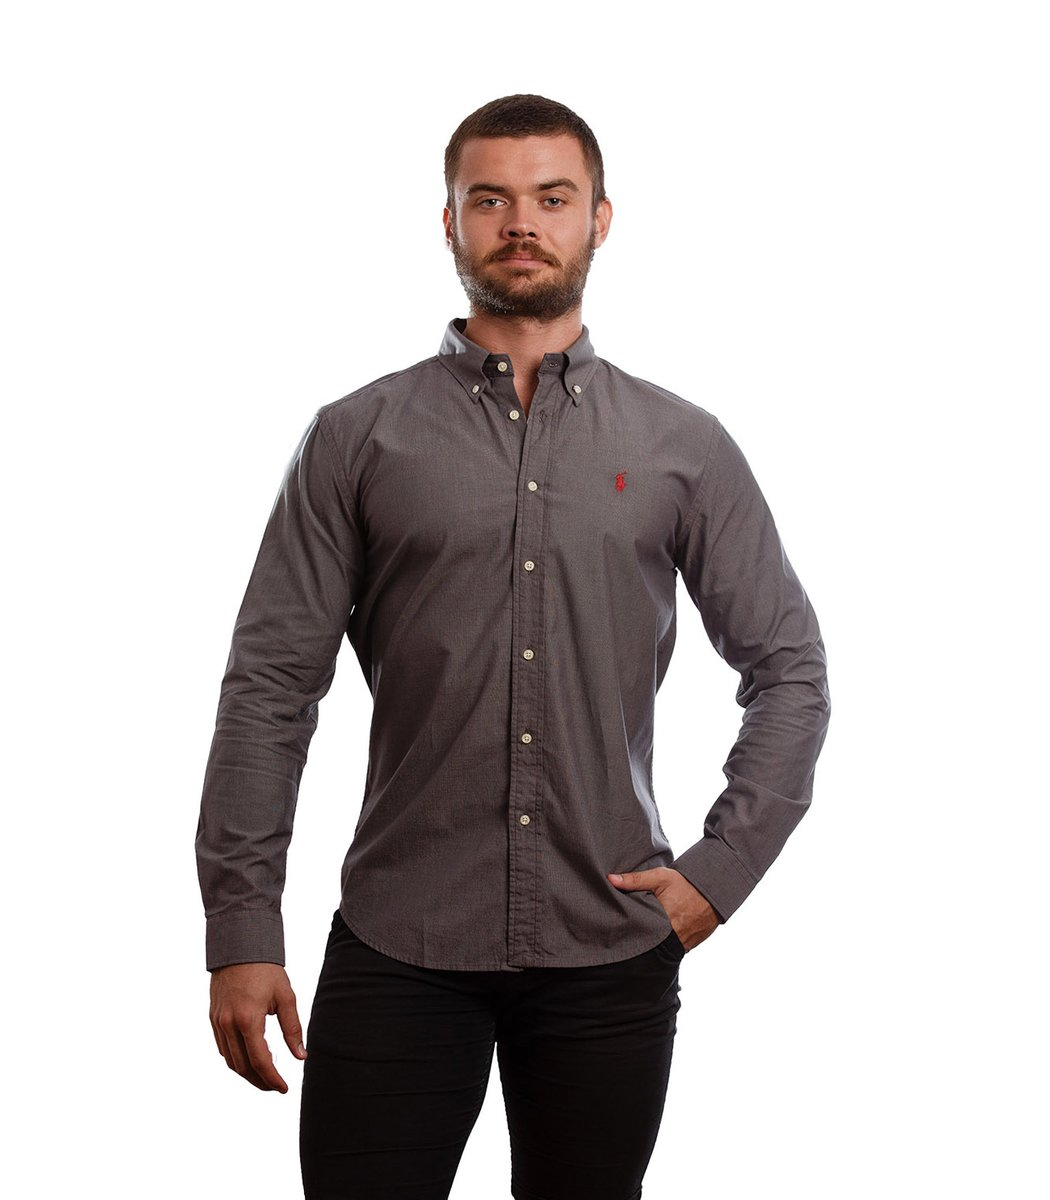 Рубашка POLO Ralph Lauren RR1 (Темно-серый) - Темно серый - Вид 2